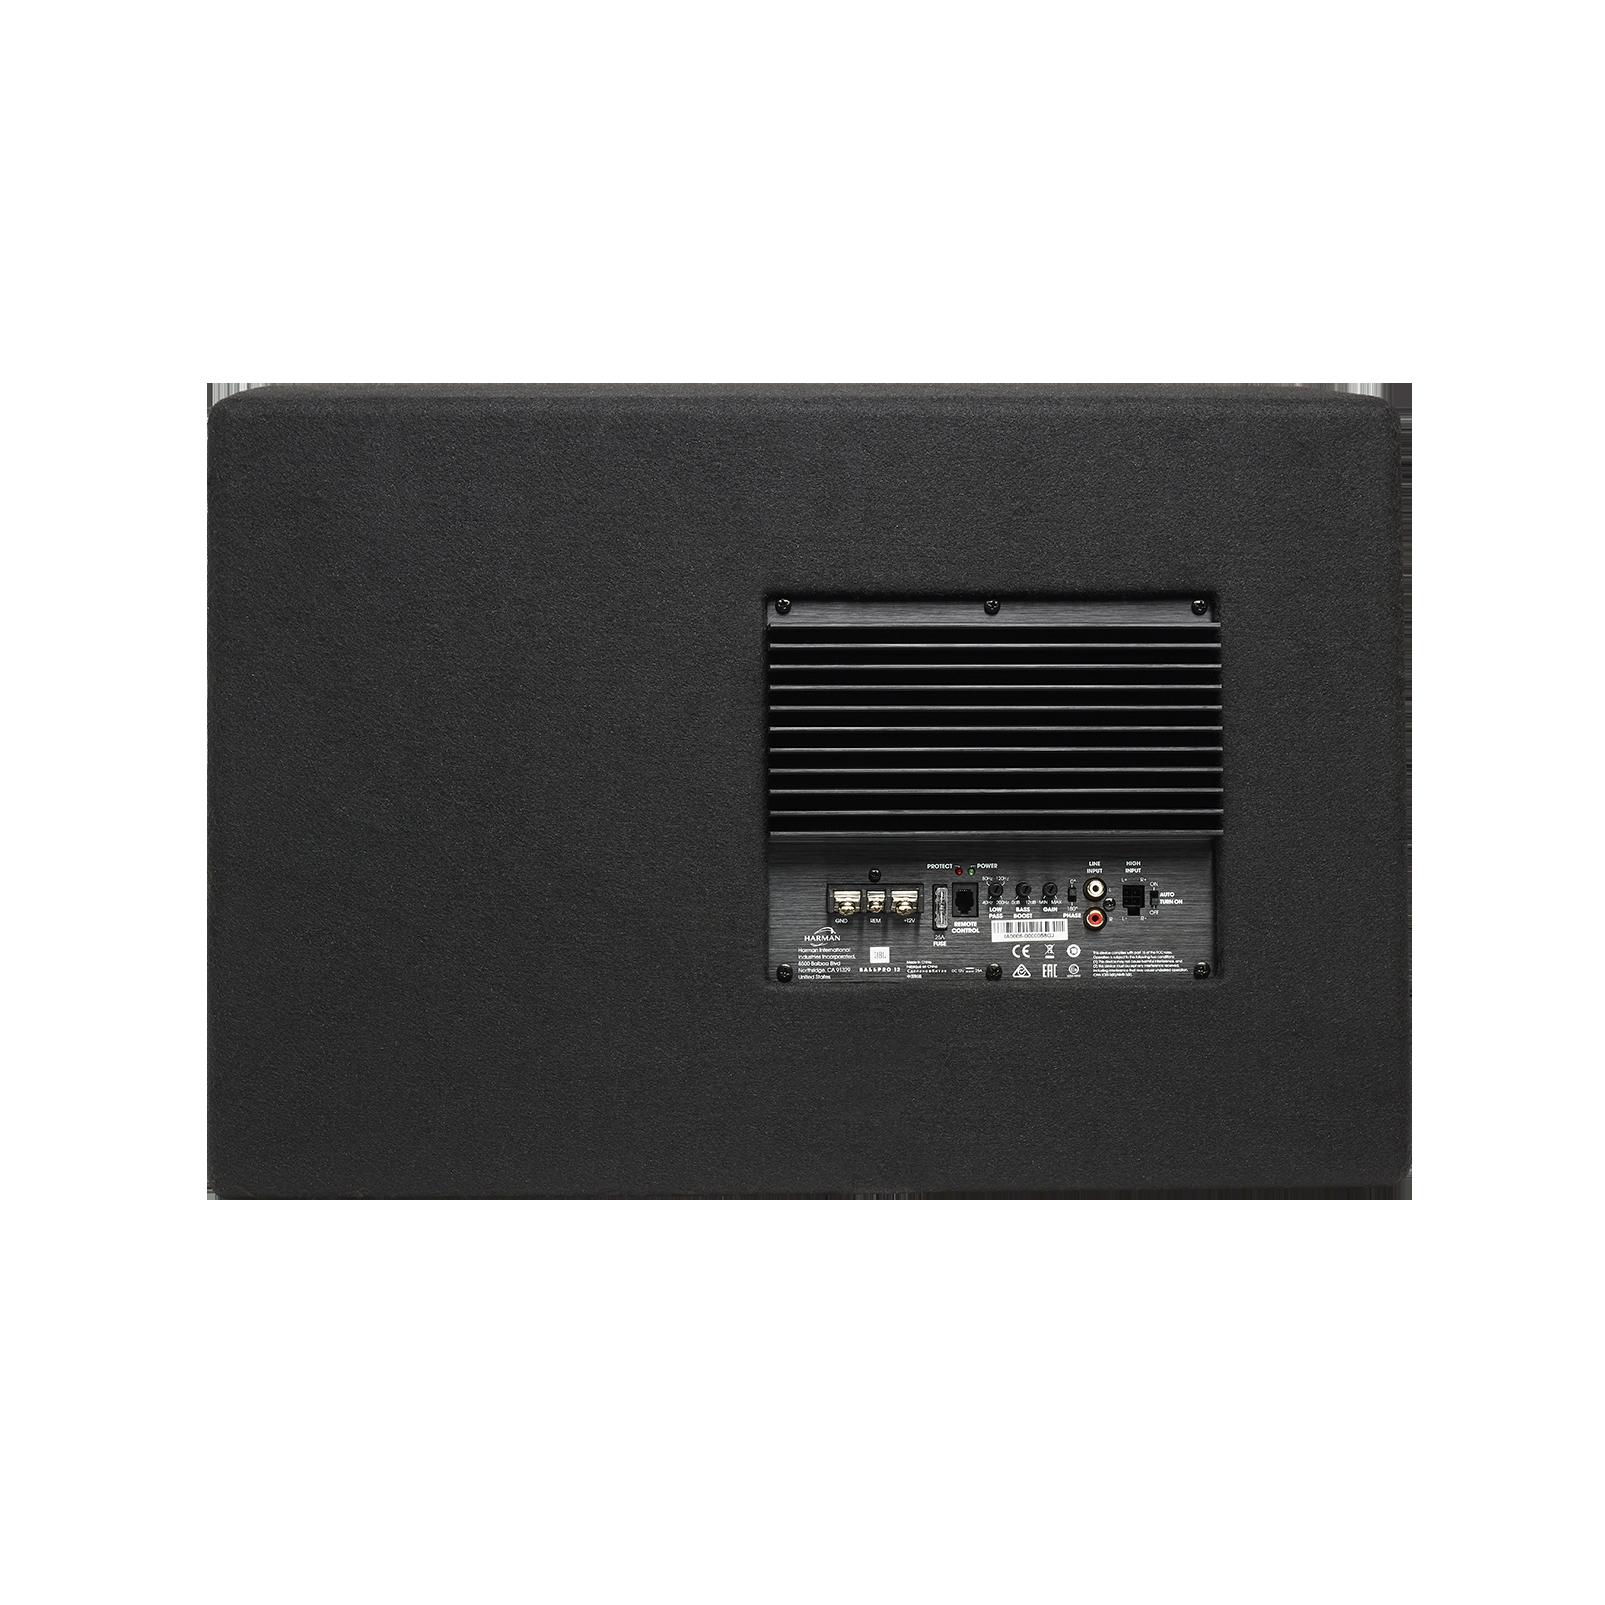 "JBL BassPro 12 - Black - 12"" (300mm) Car Audio Powered Subwoofer System with Slipstream Port Technology - Back"